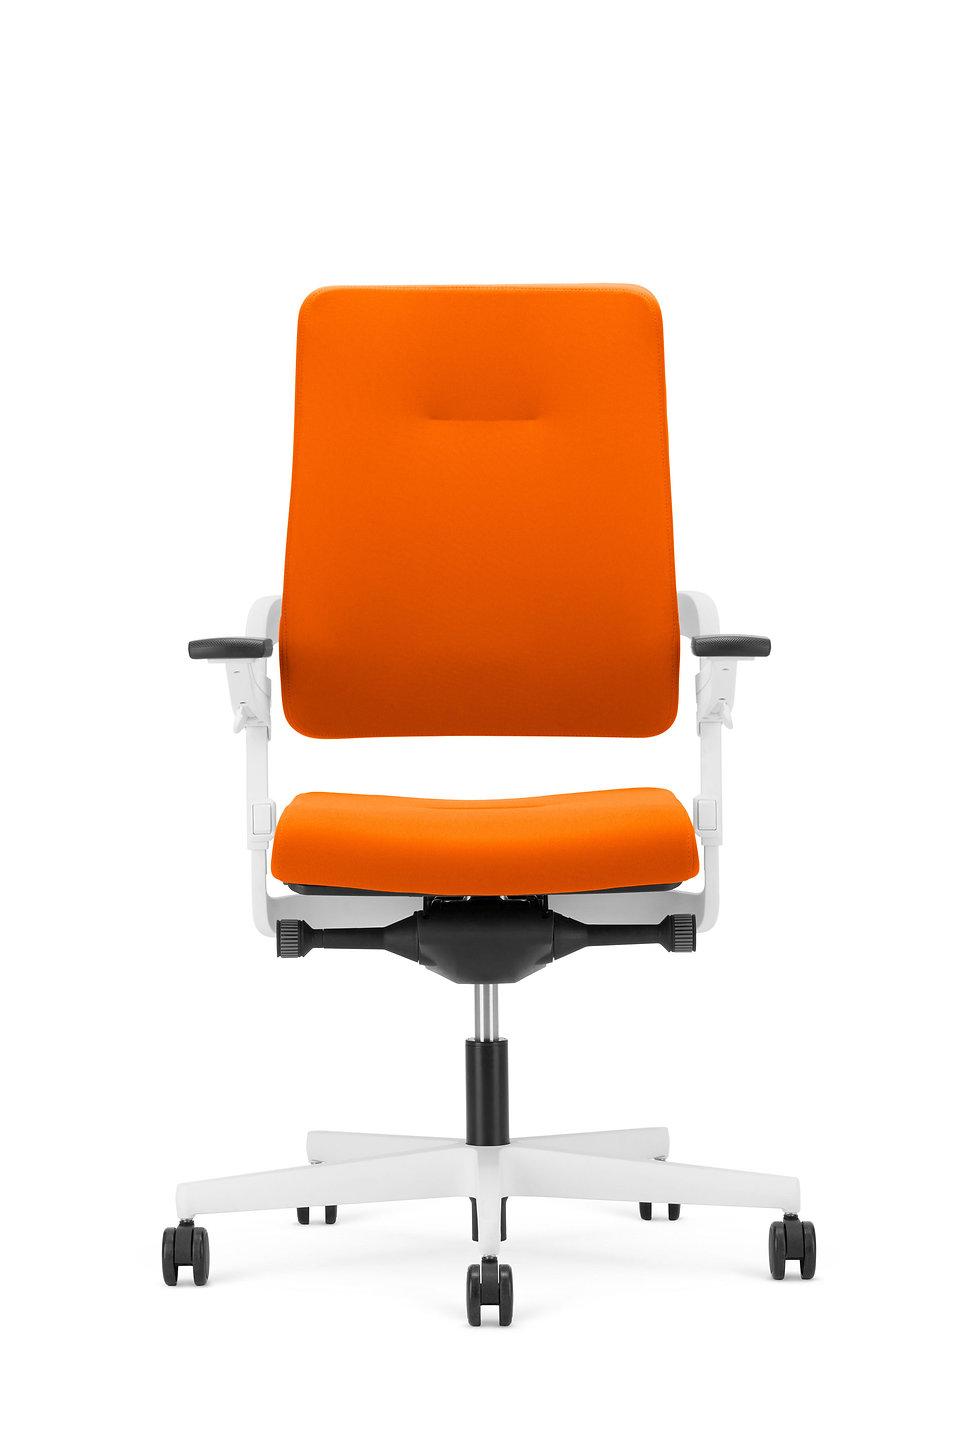 Xilium_Classic_Ergonomic_office_chair.jpg